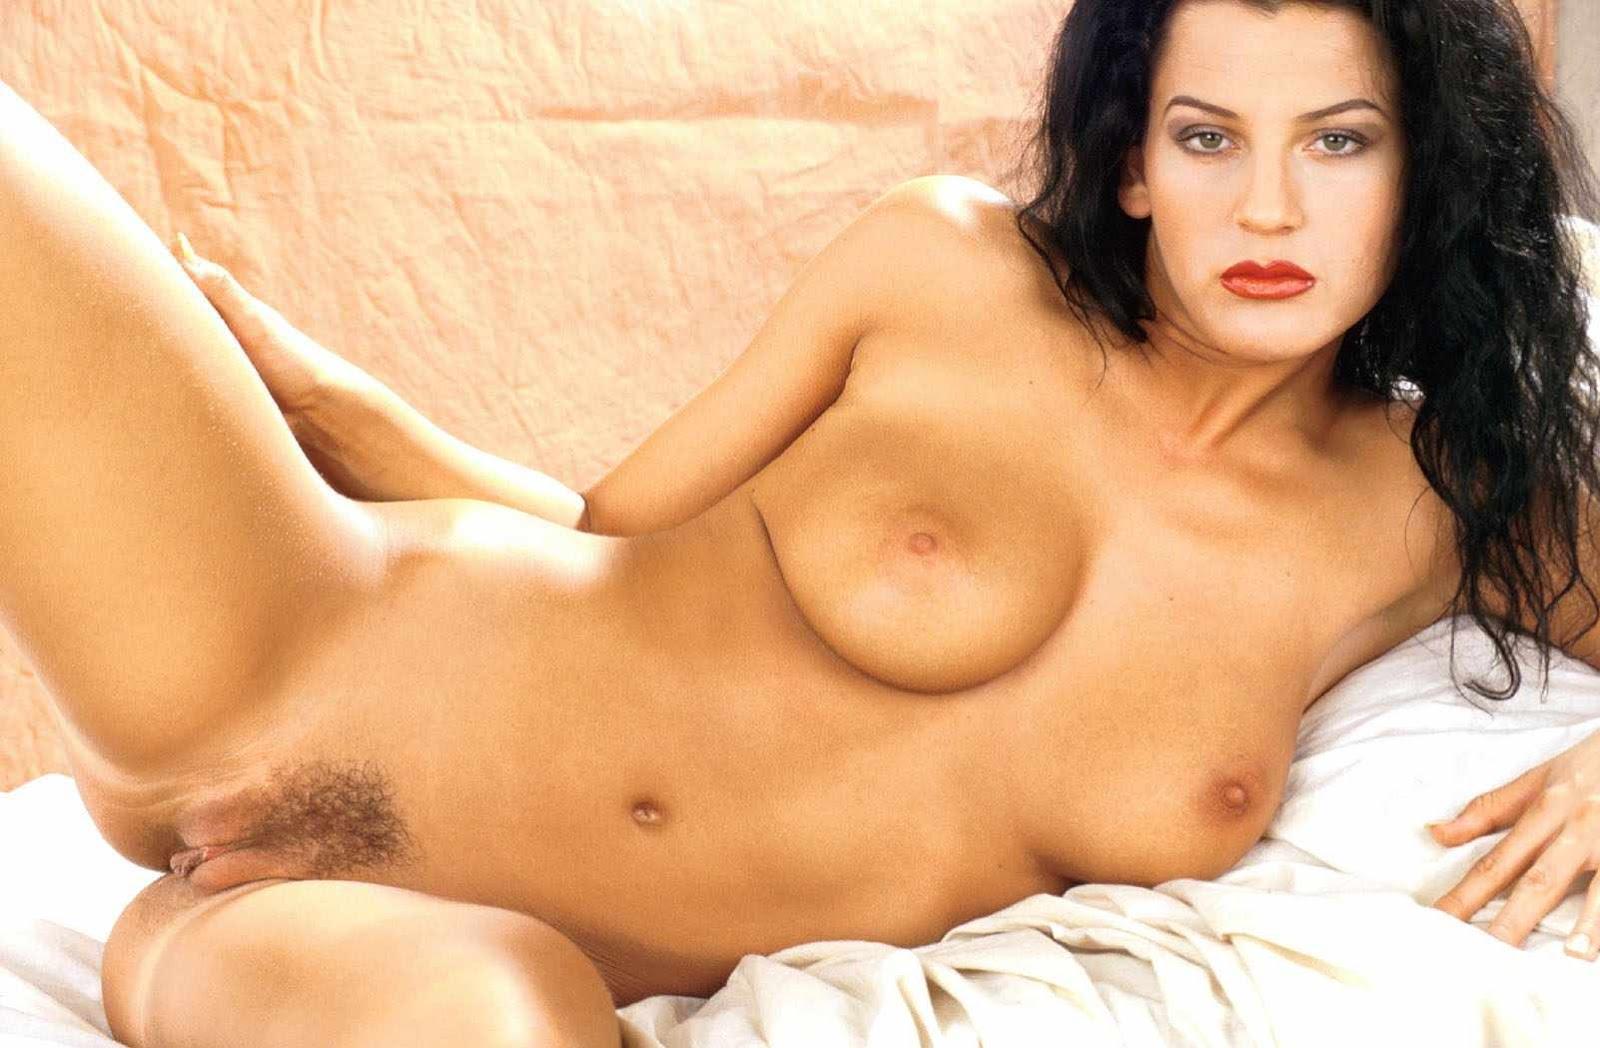 Роуз макгоуэн секс 21 фотография